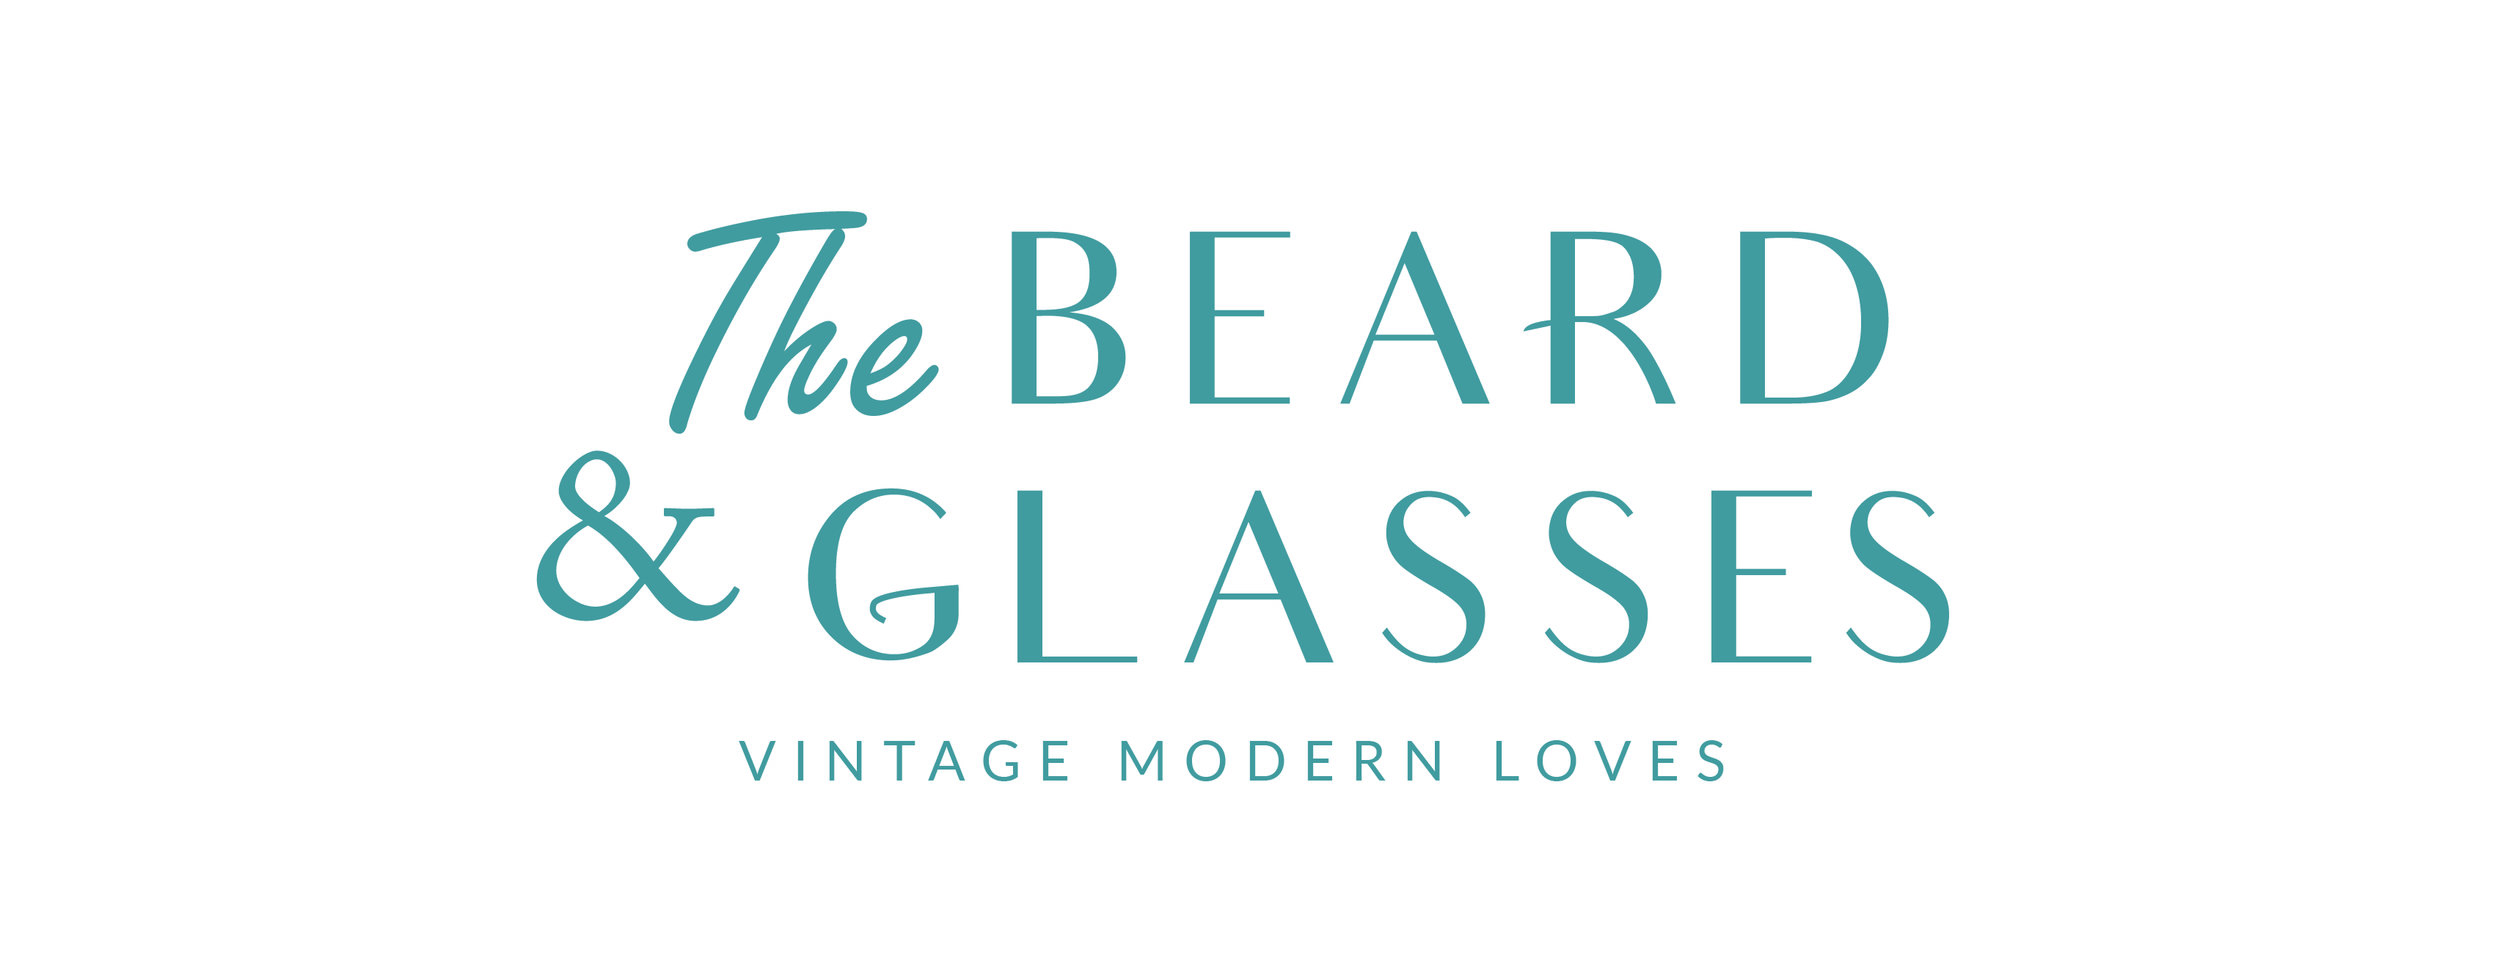 TheBeardandGlasses_logo+slogan-blue.jpg